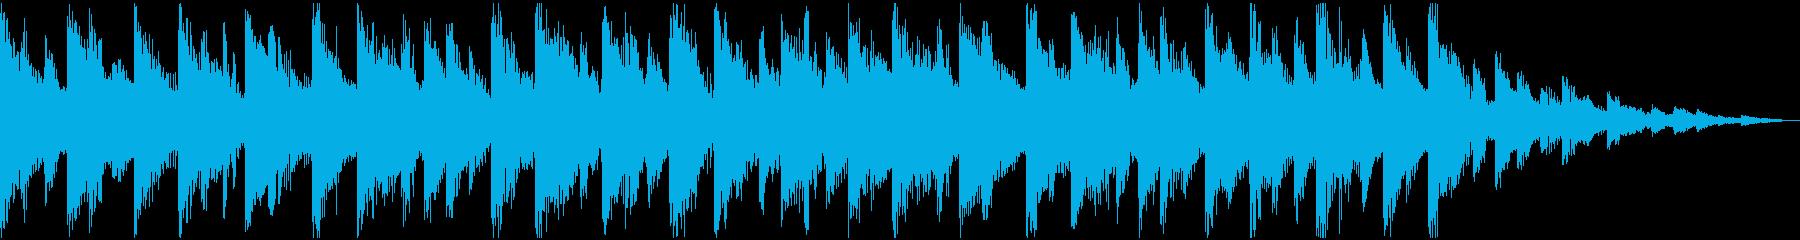 YouTube エンディングカードEDMの再生済みの波形